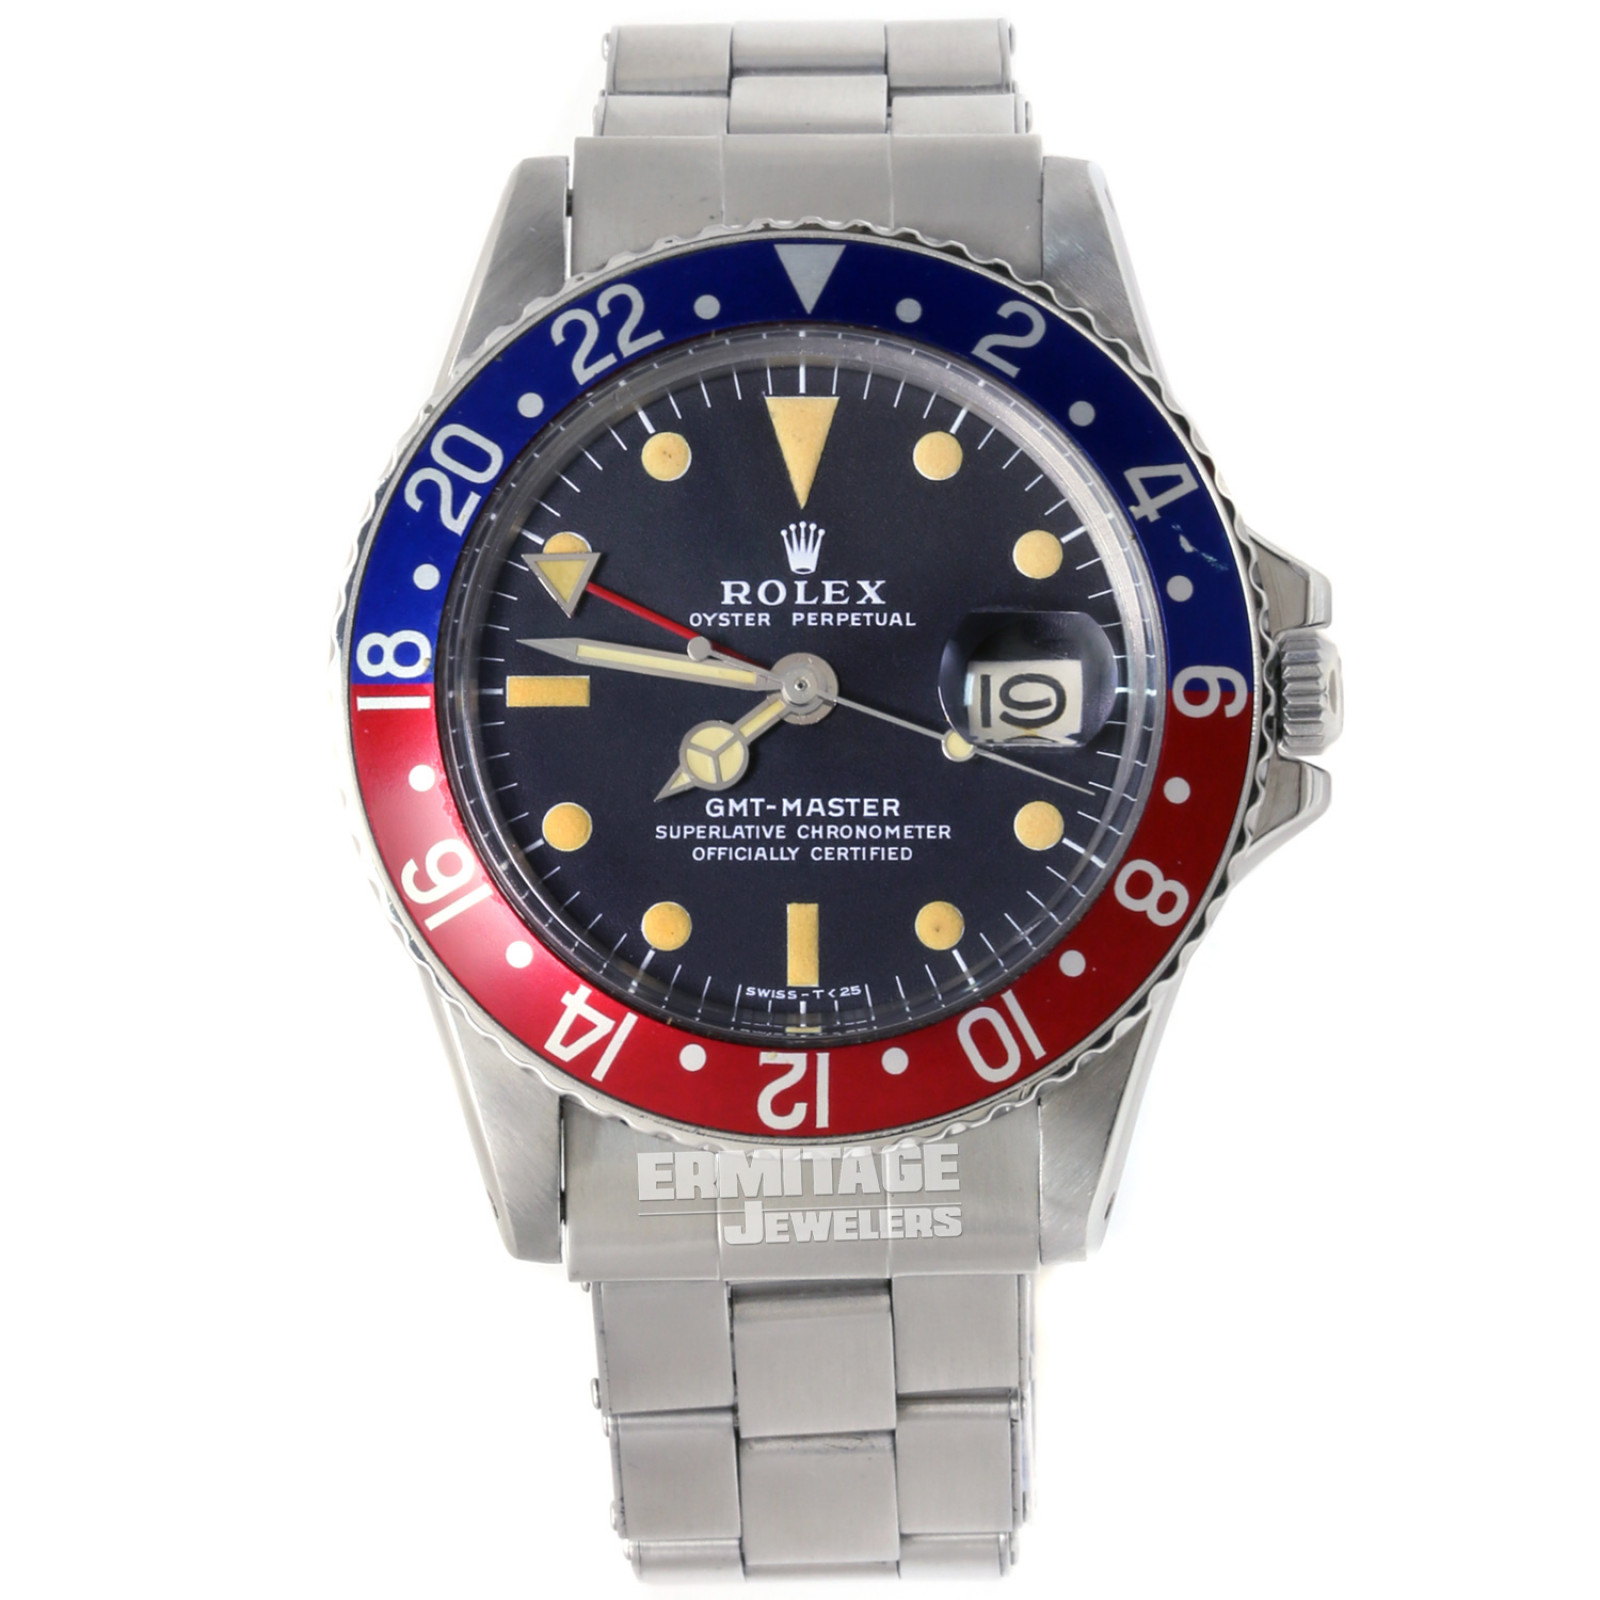 Vintage Rolex 1675 40 mm Steel on Oyster, Blue & Red Ceramic, Pepsi Style Bezel